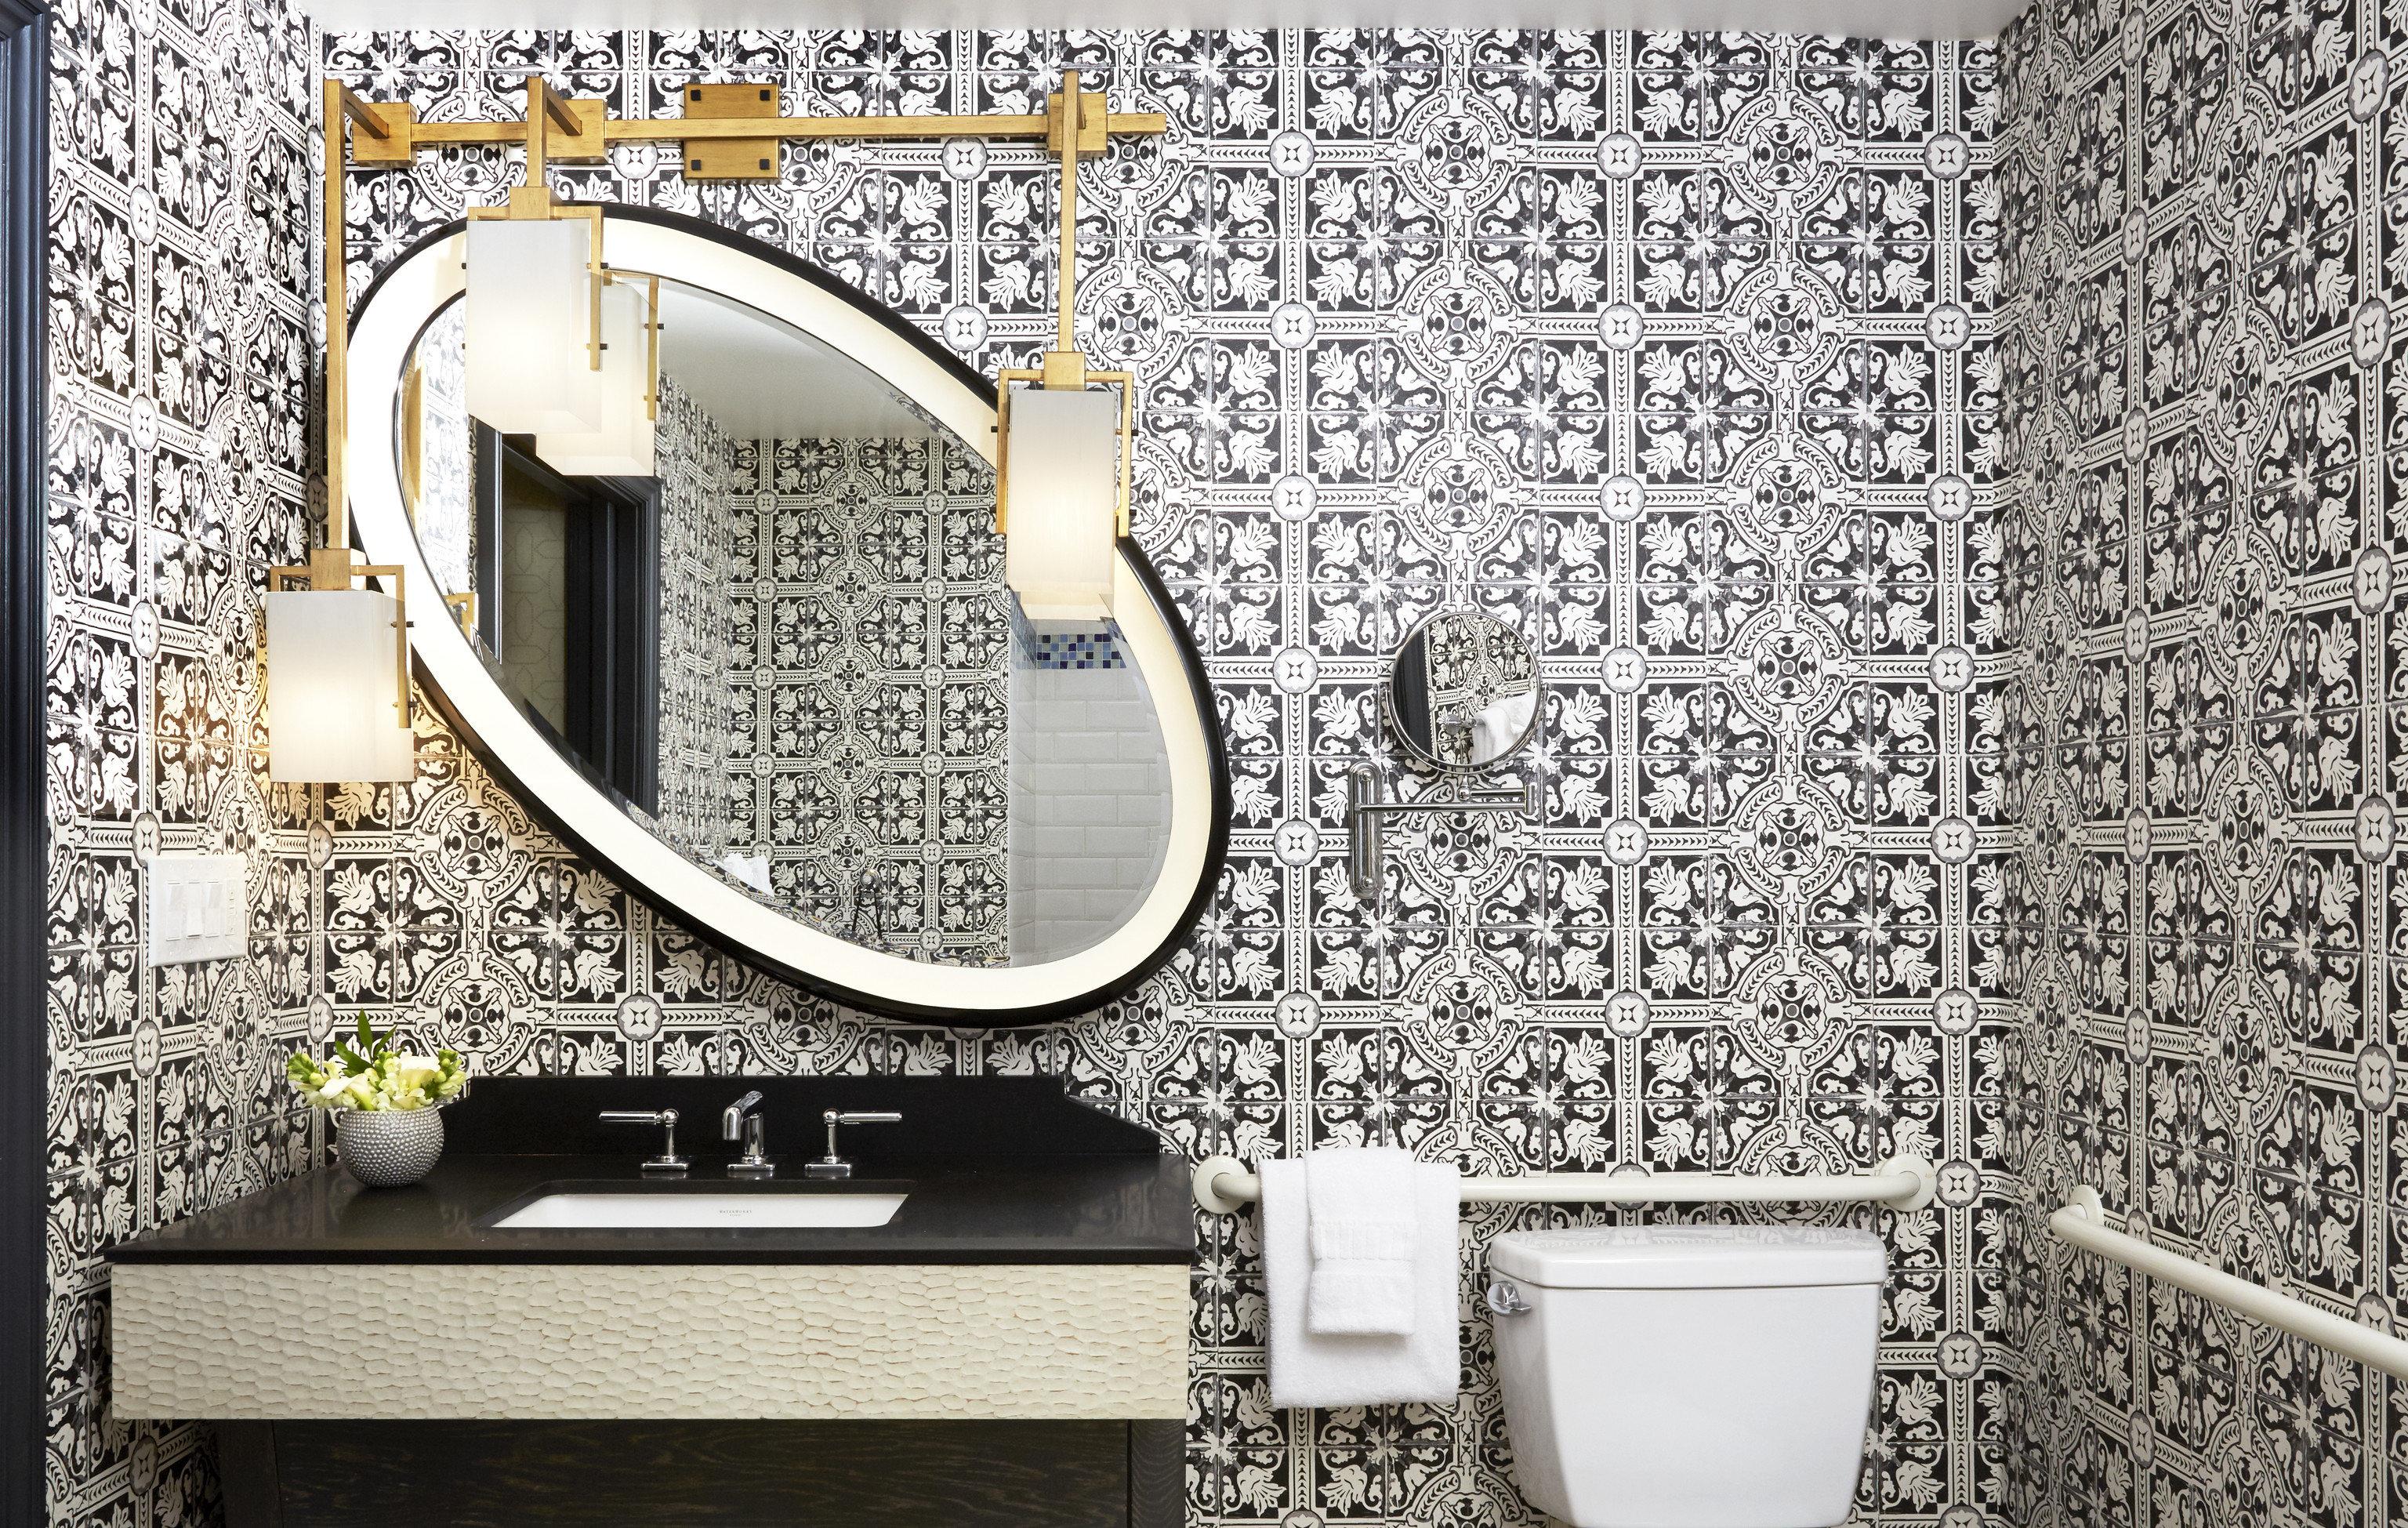 Hotels bathroom toilet text indoor font wall Design brand interior design wallpaper pattern tiled